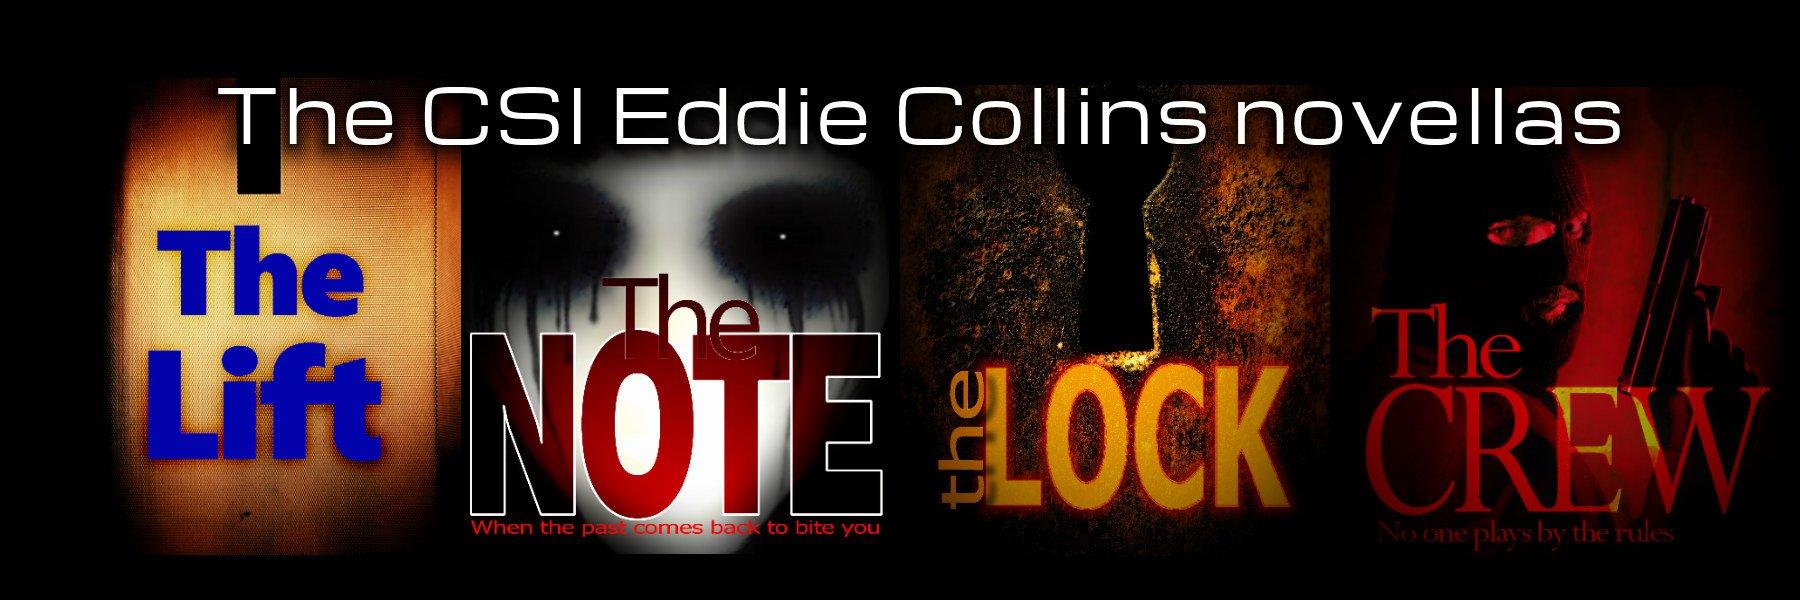 CSI Eddie Collins Novellas